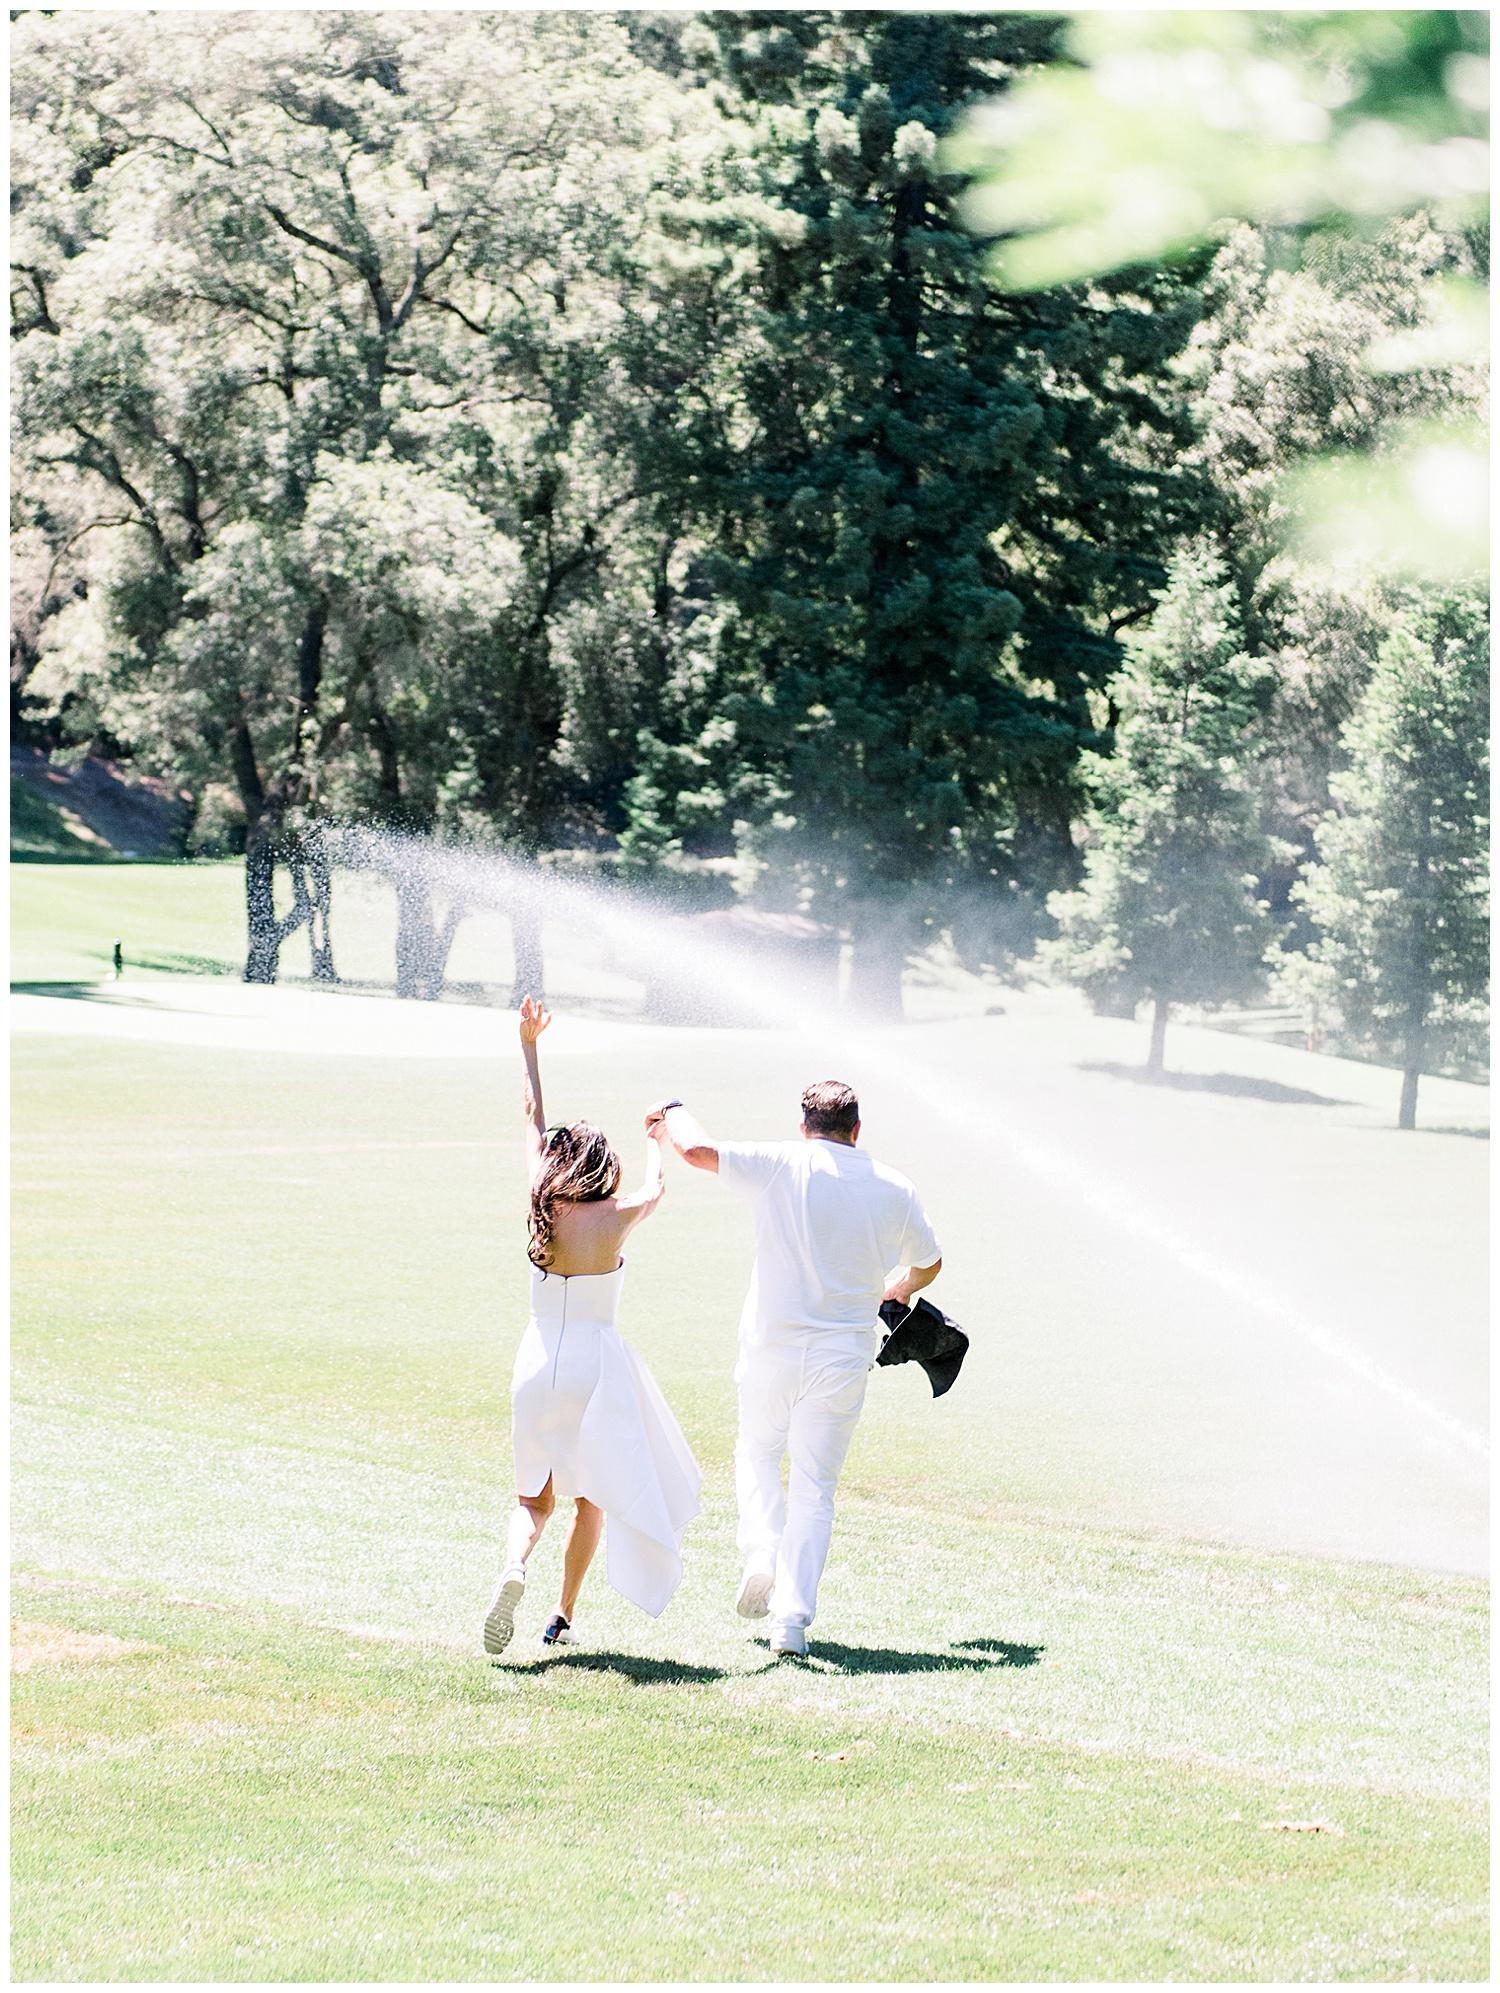 Janine_Licare_Photography_San_Francisco_Wedding_Photographer_Meadowood_Napa_Valley_Sonoma_0039.jpg